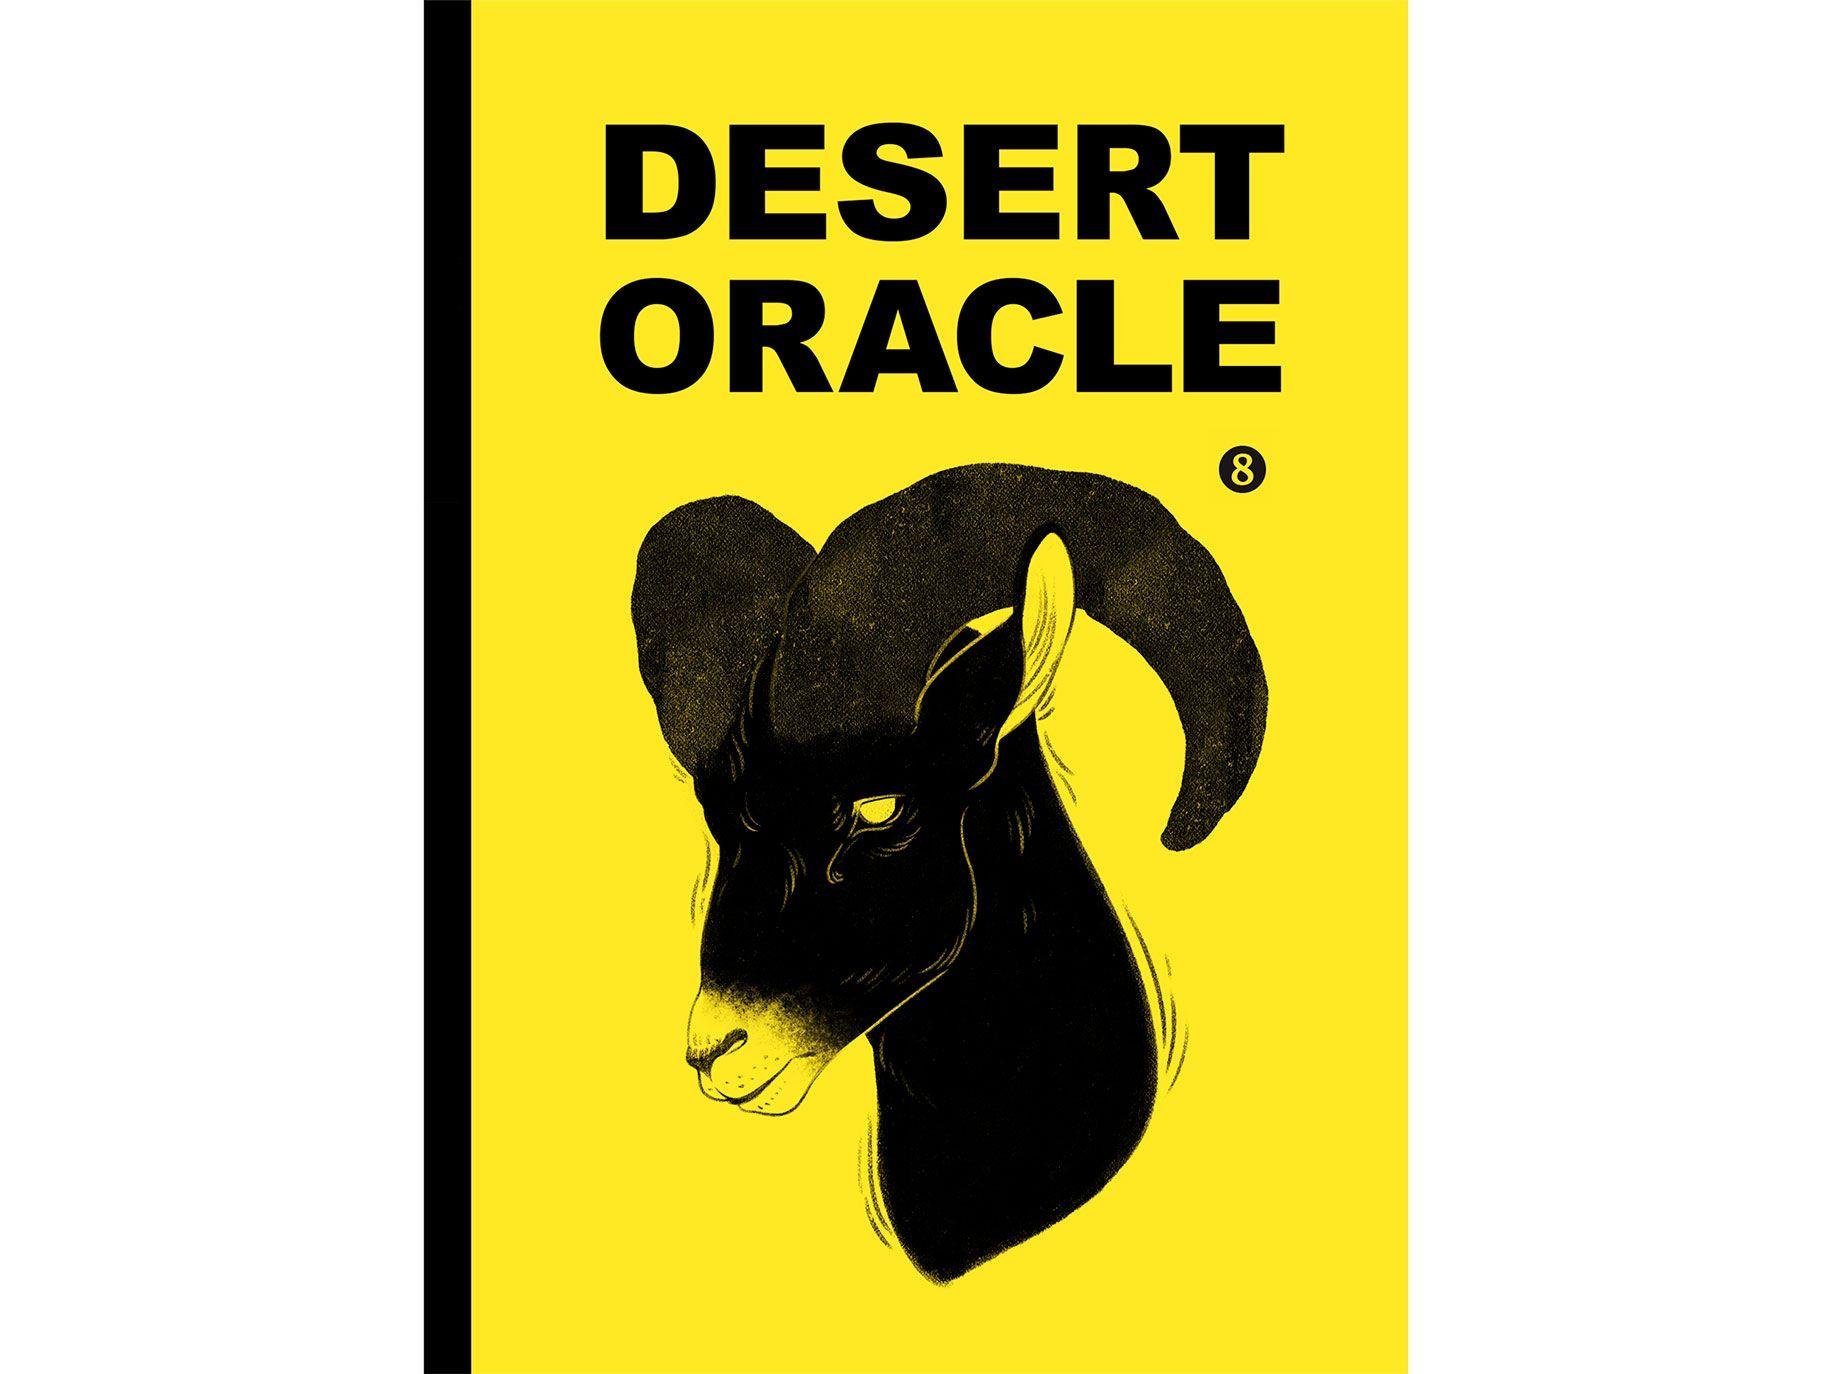 The quarterly magazine Desert Oracle